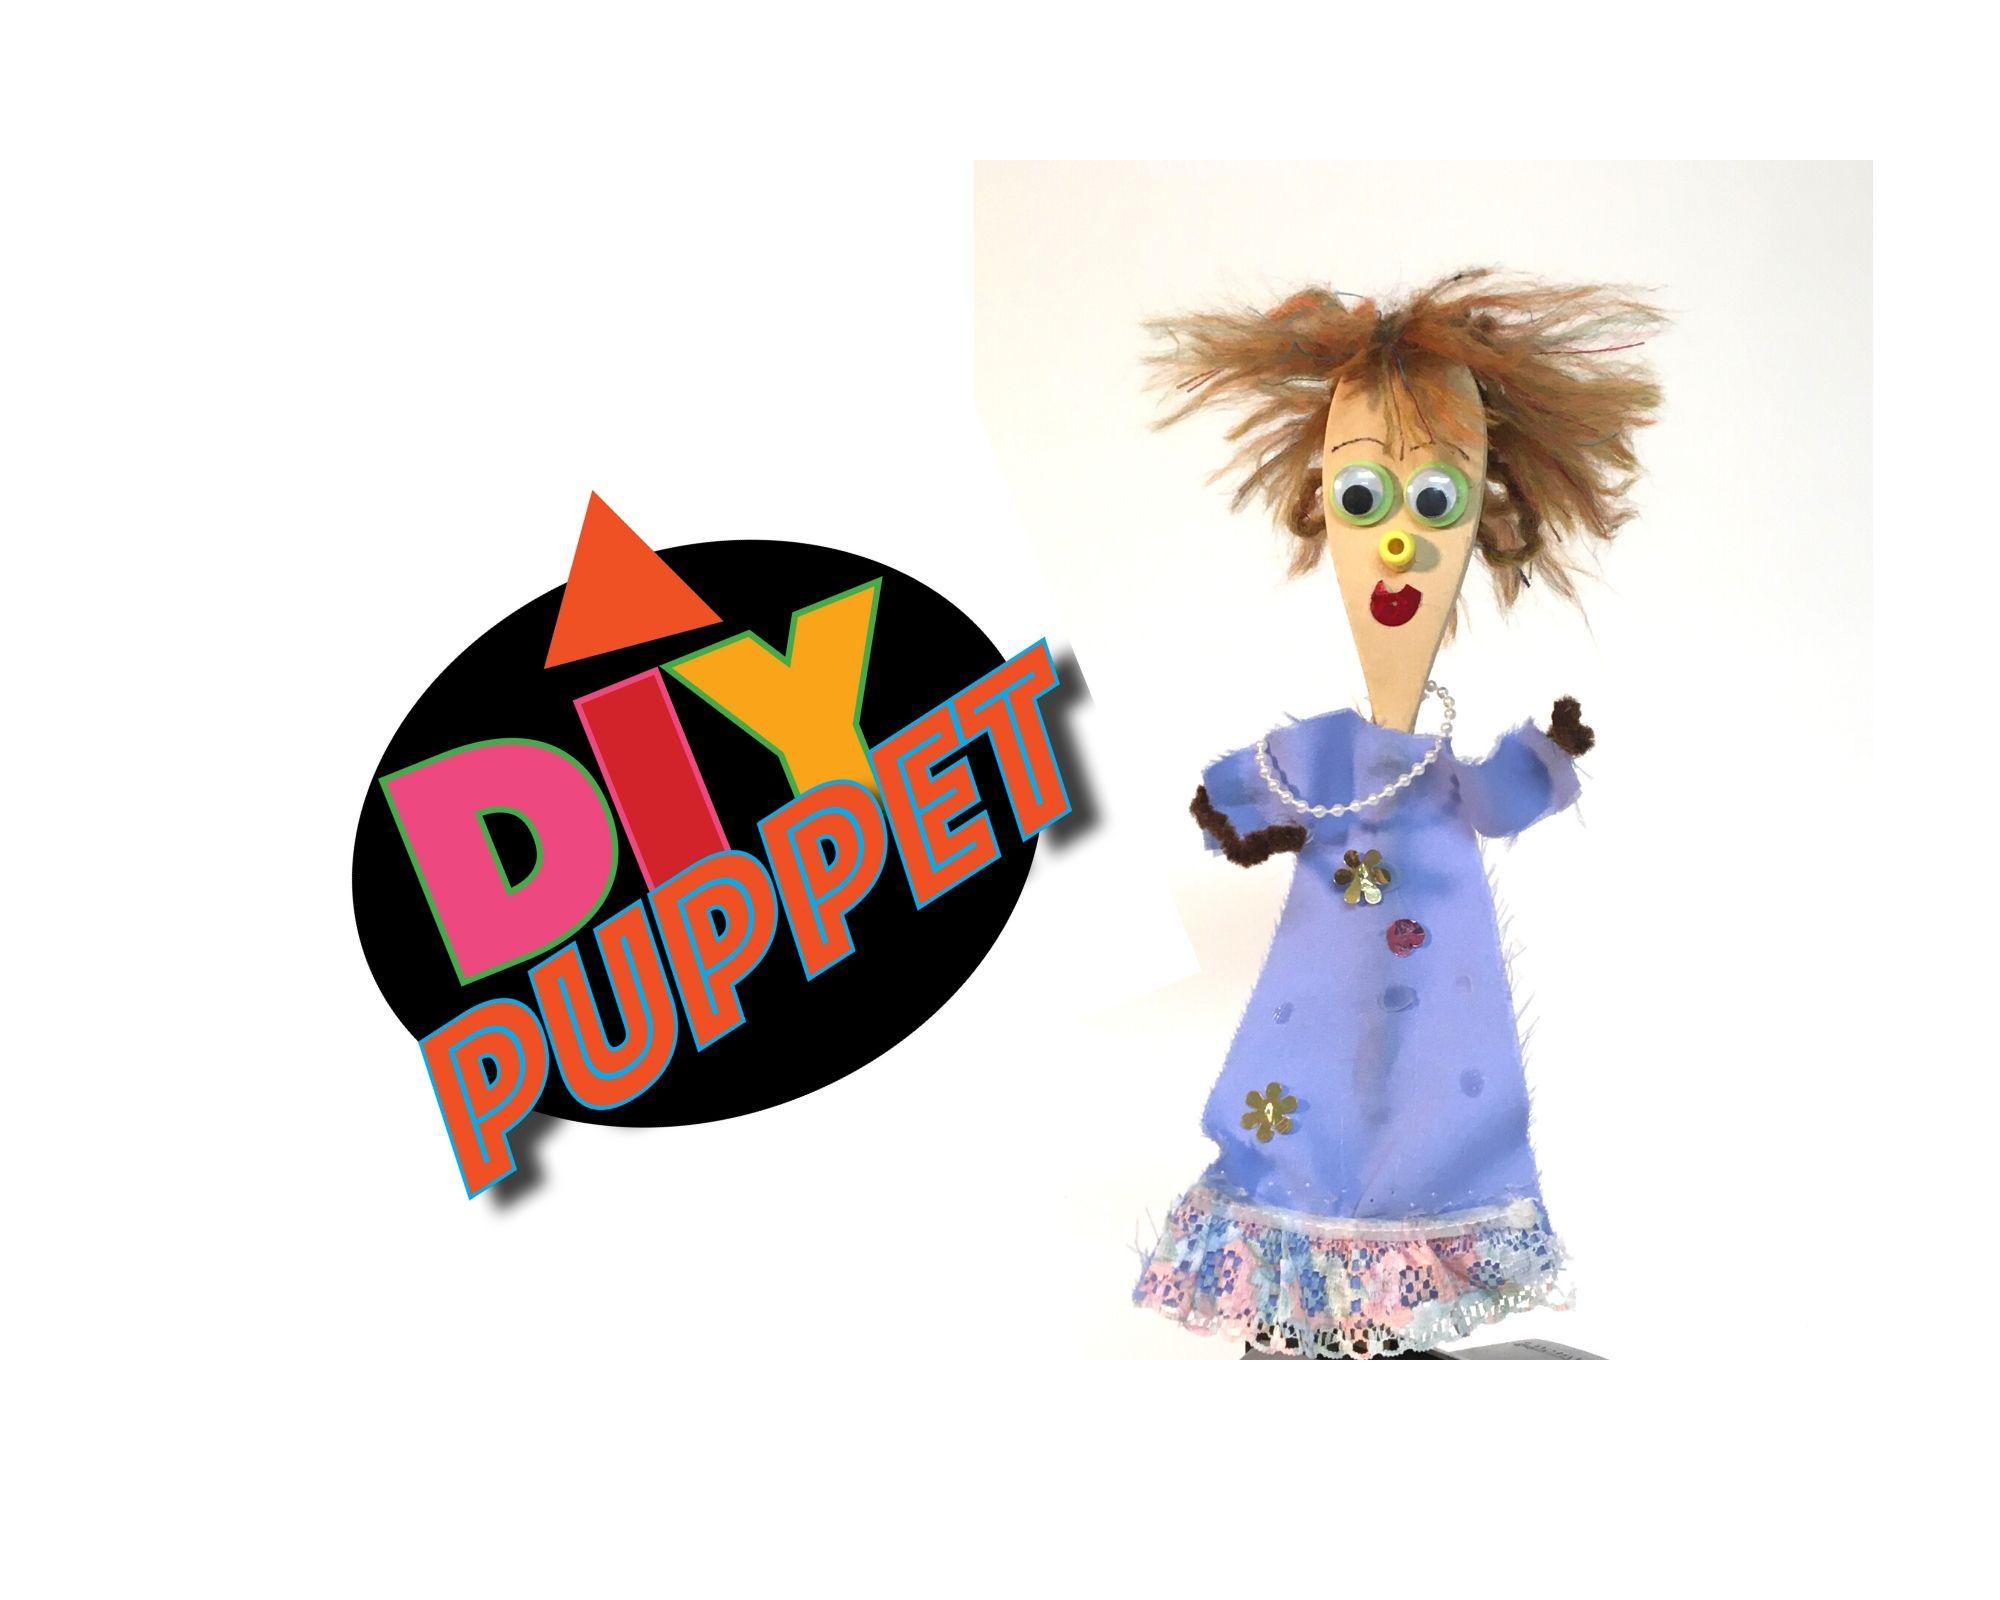 DIY Spoon Puppet